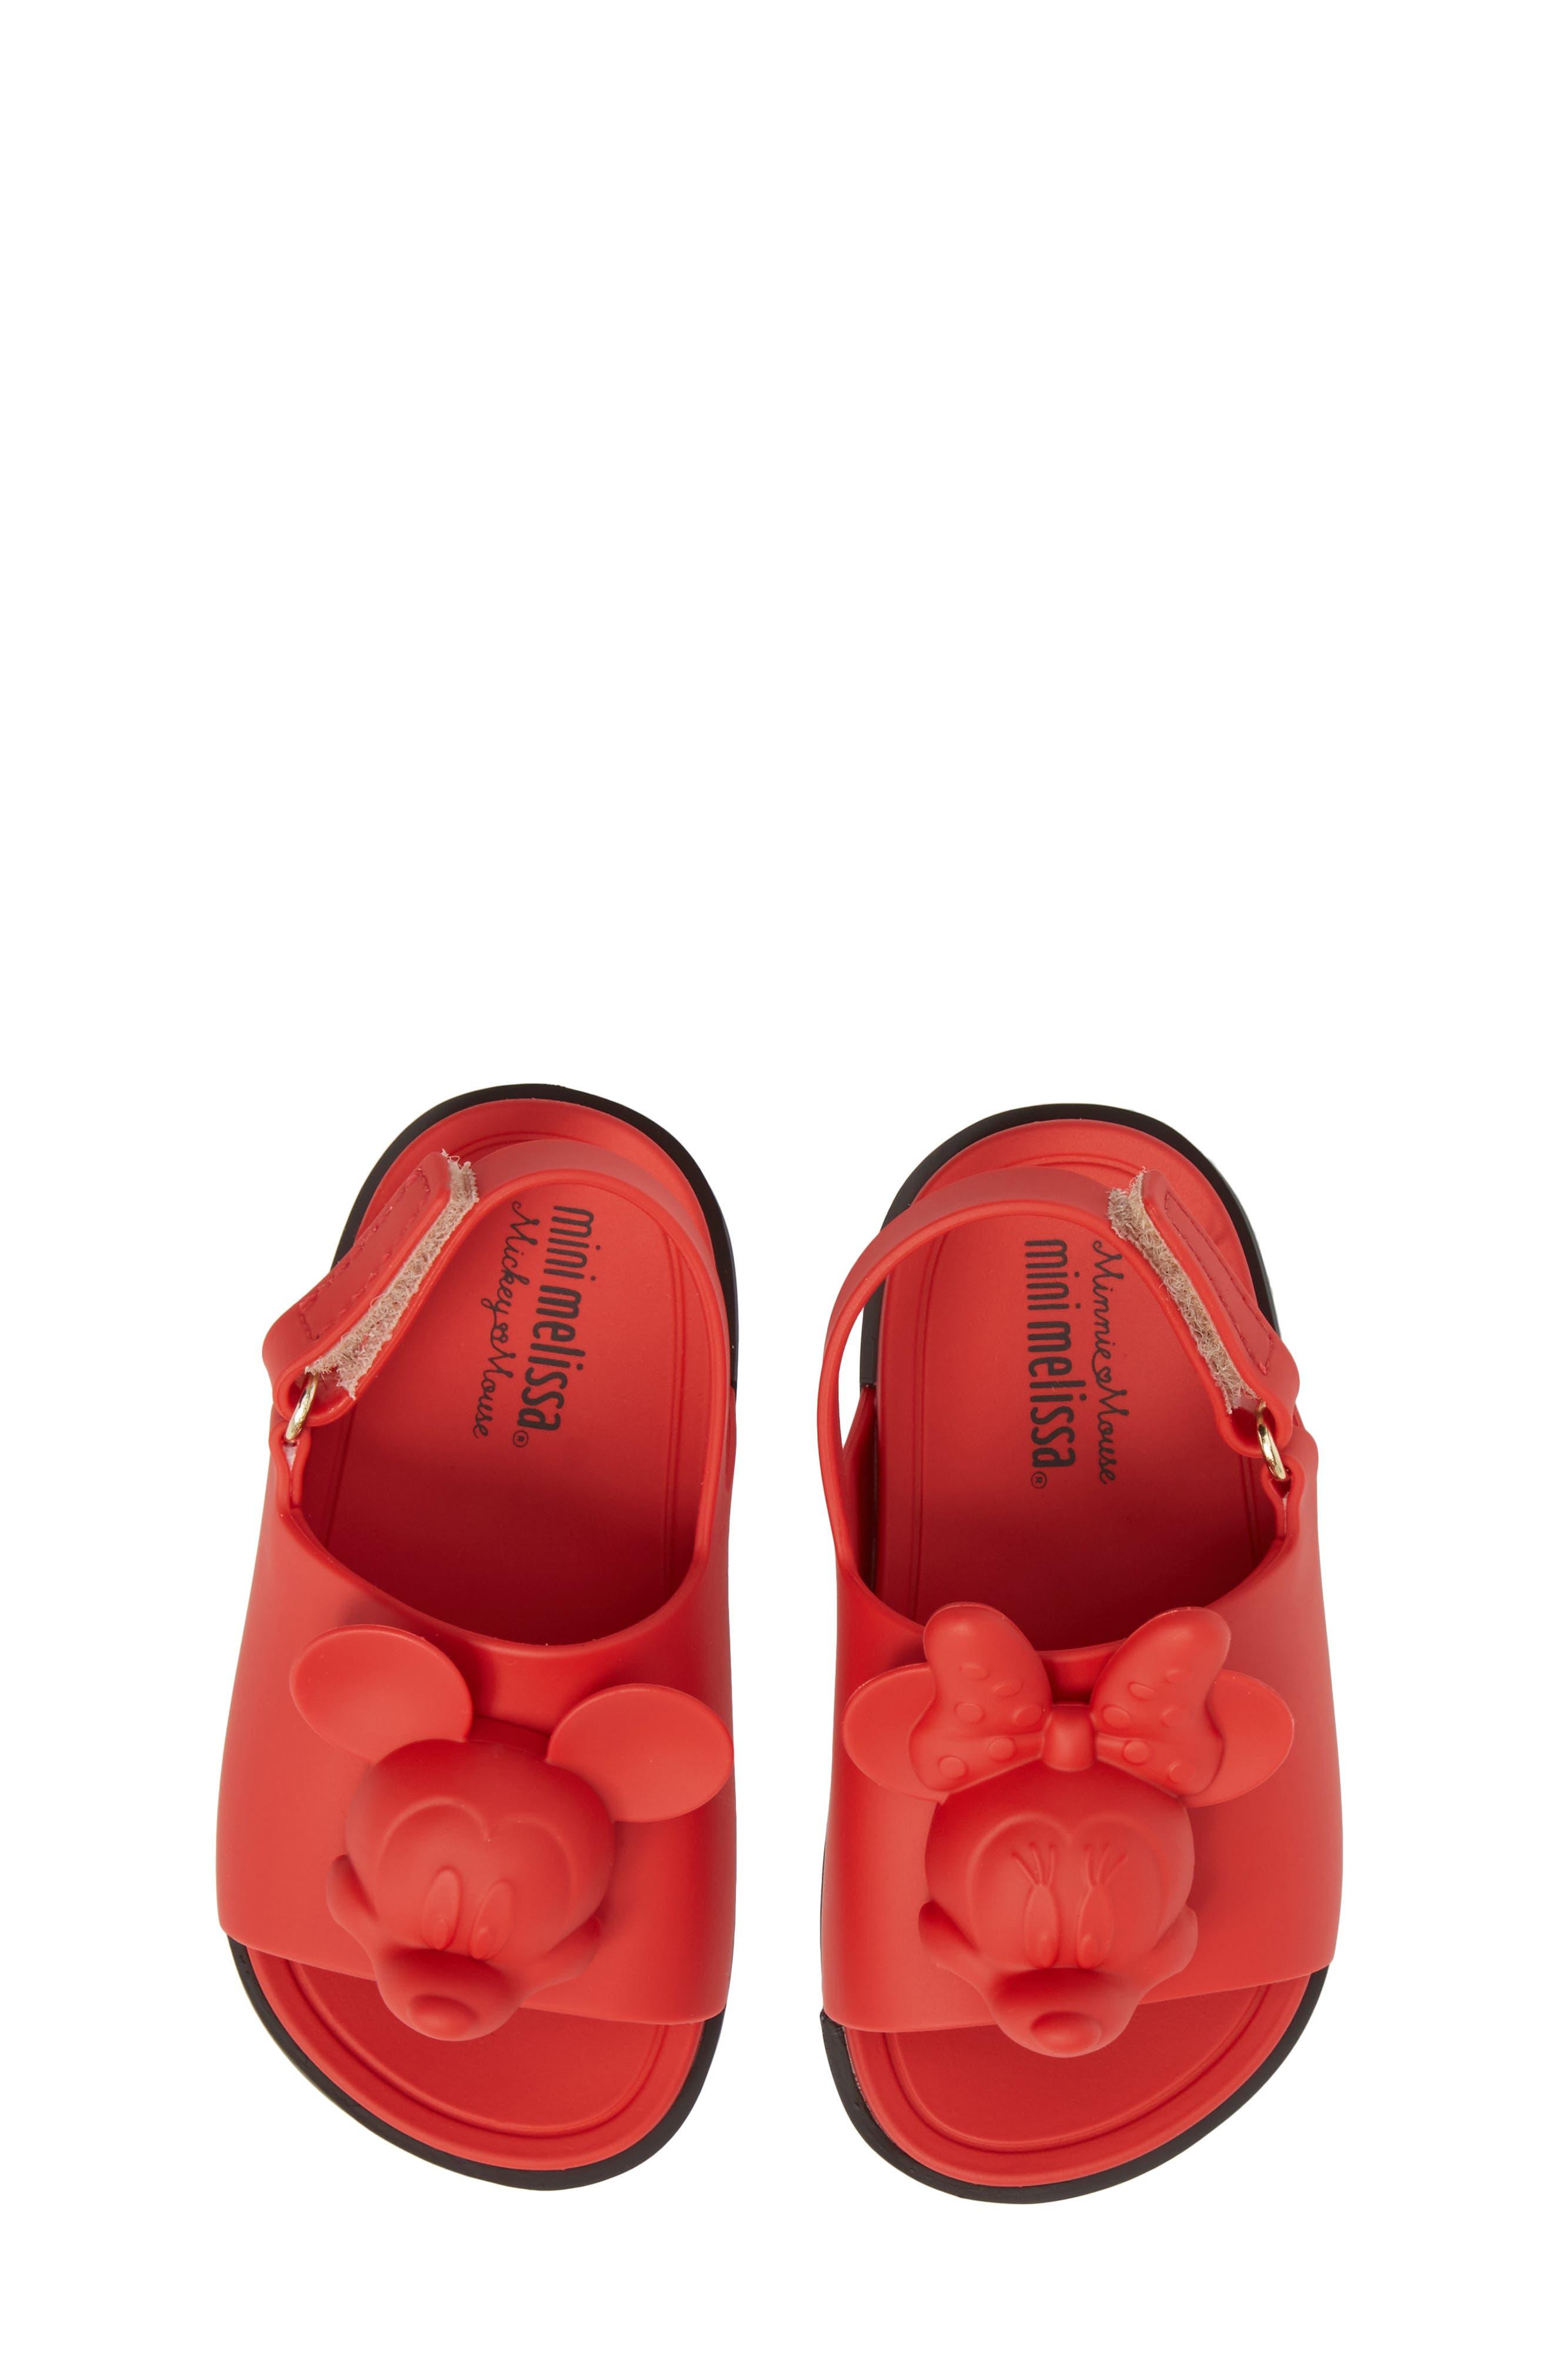 Disney<sup>®</sup> Mini Beach Sandal,                             Main thumbnail 3, color,